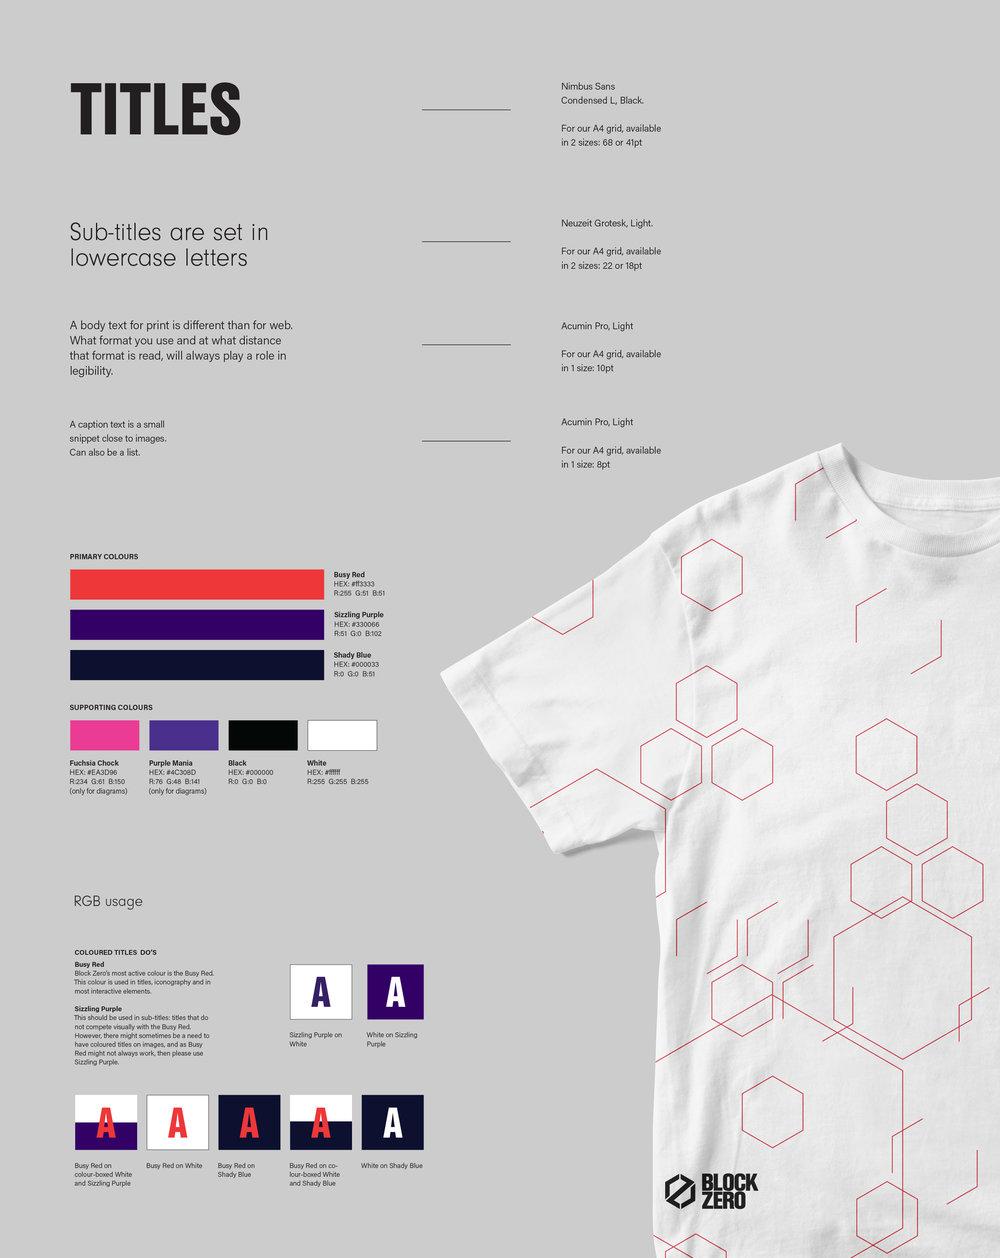 Typeface-t-shirt-Block-Zero-Asimakidis.jpg